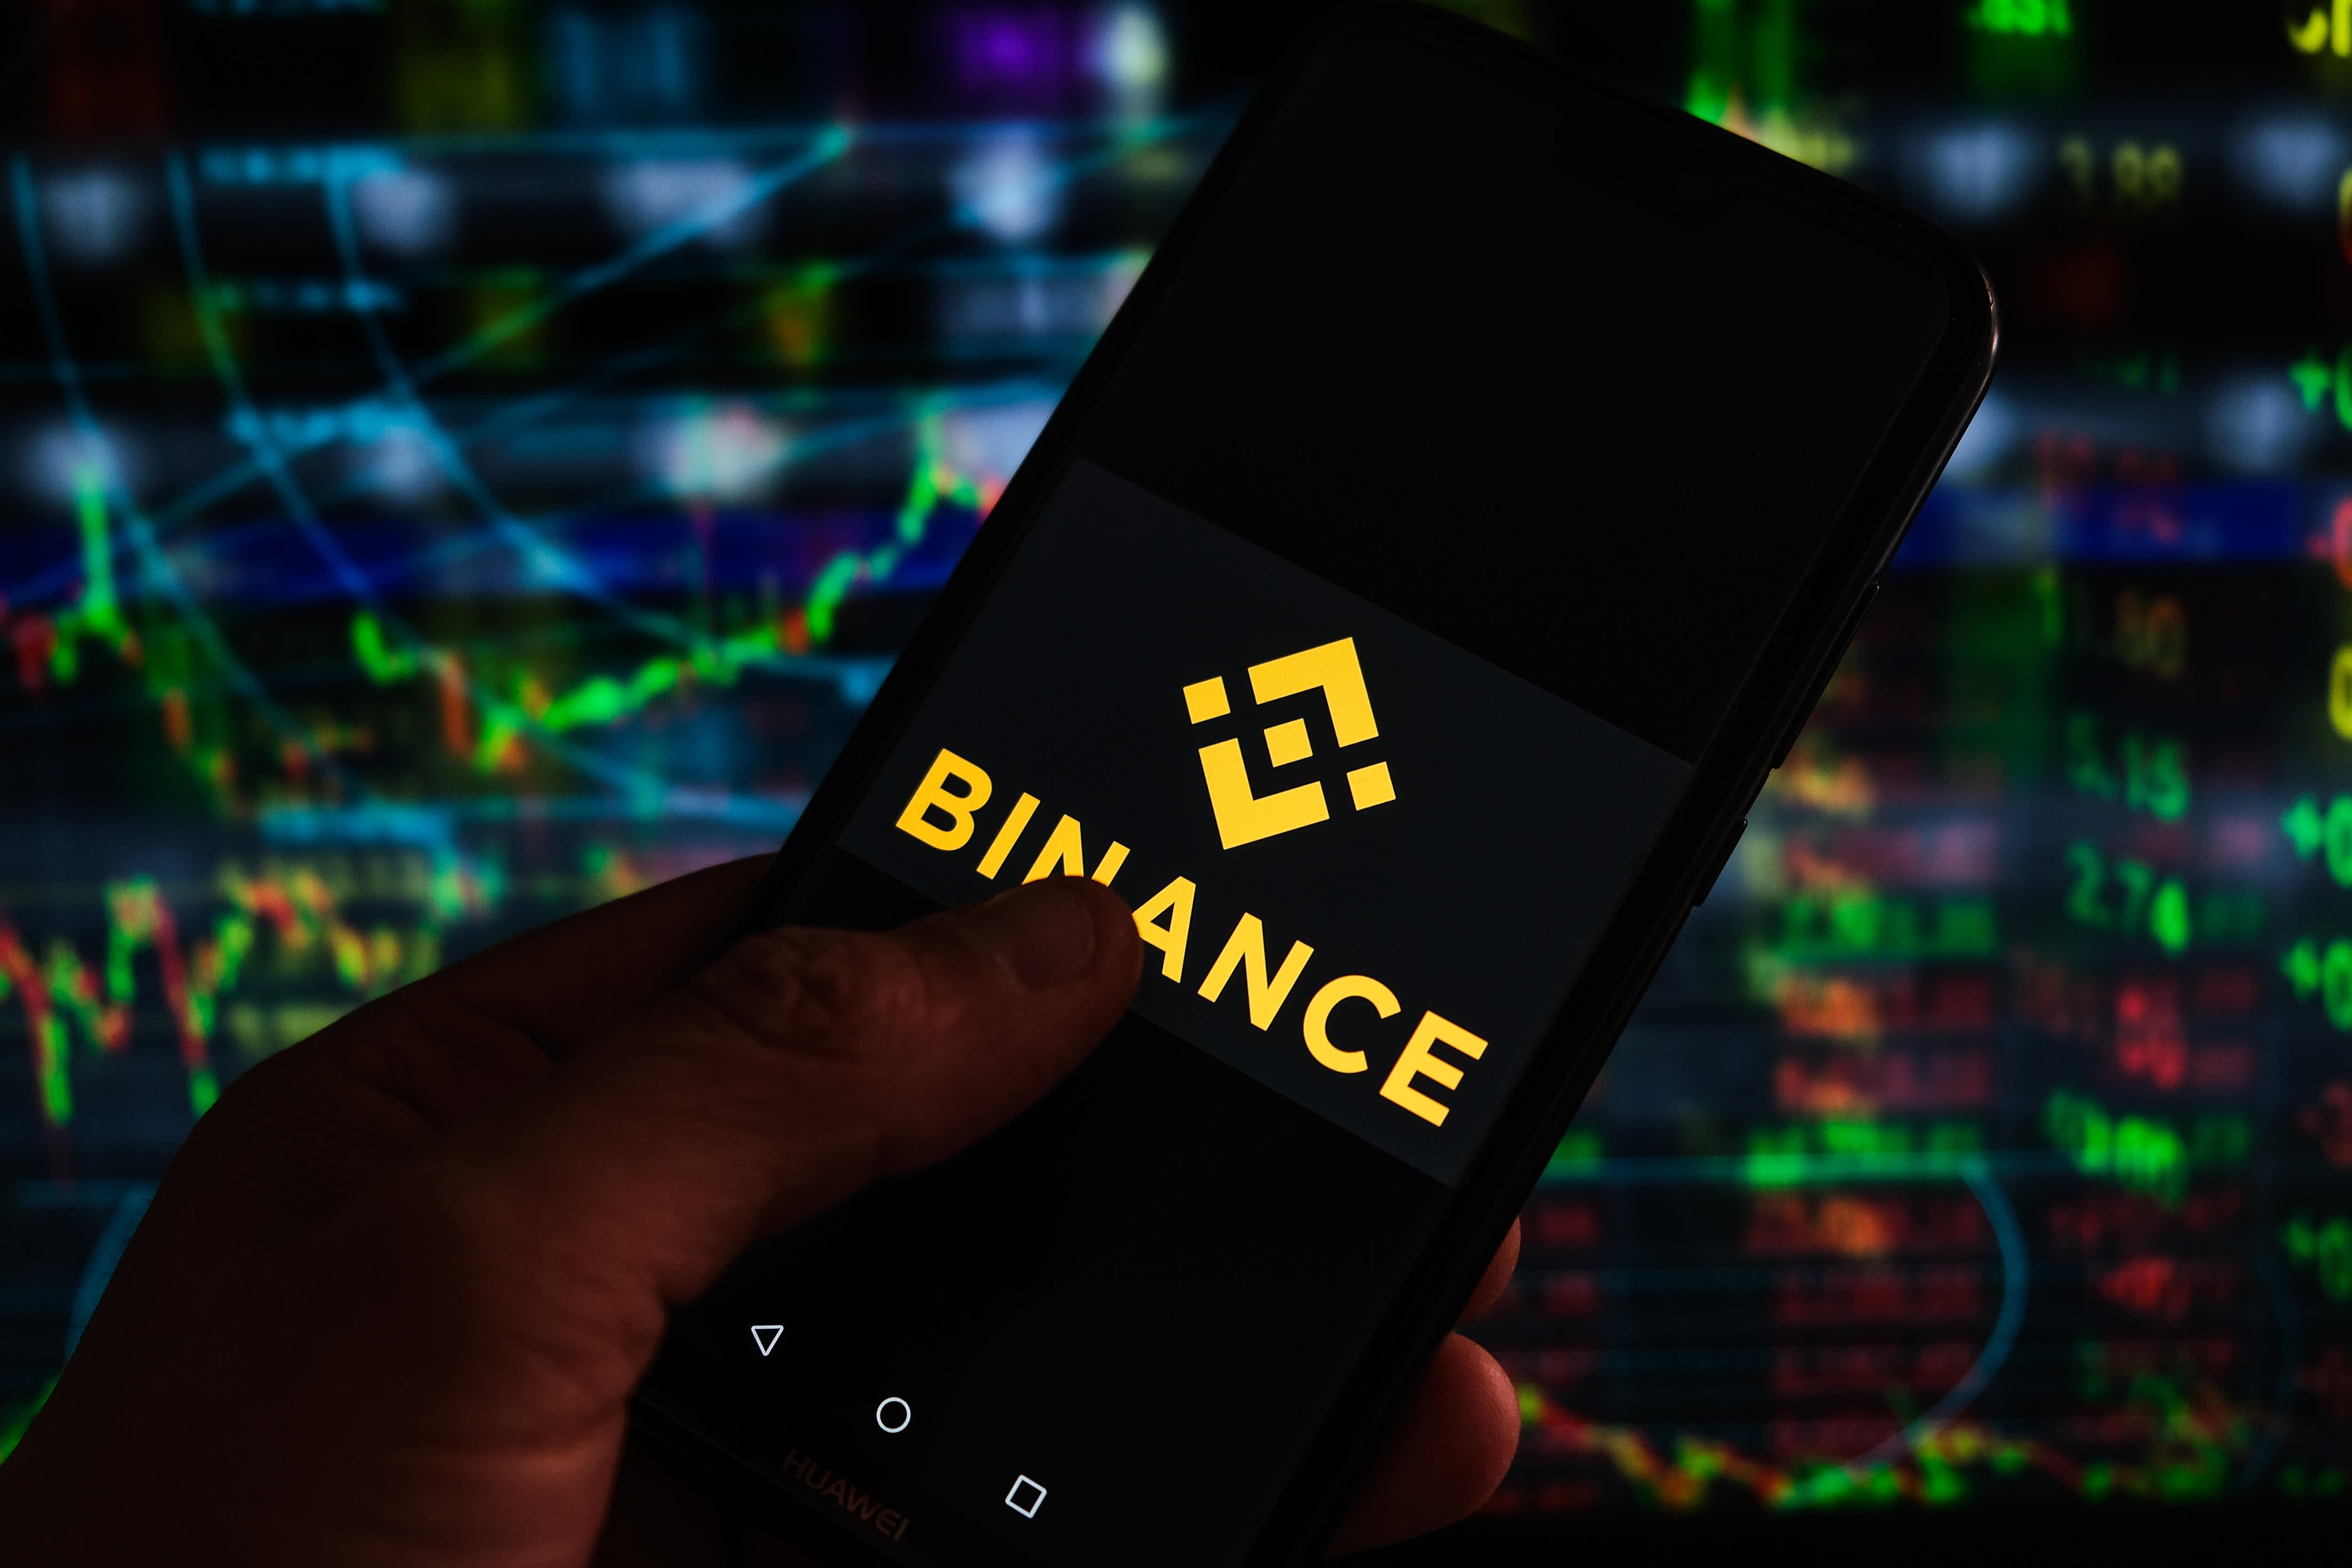 Crypto exchange Binance stops selling digital versions of stocks like Tesla as regulators circle